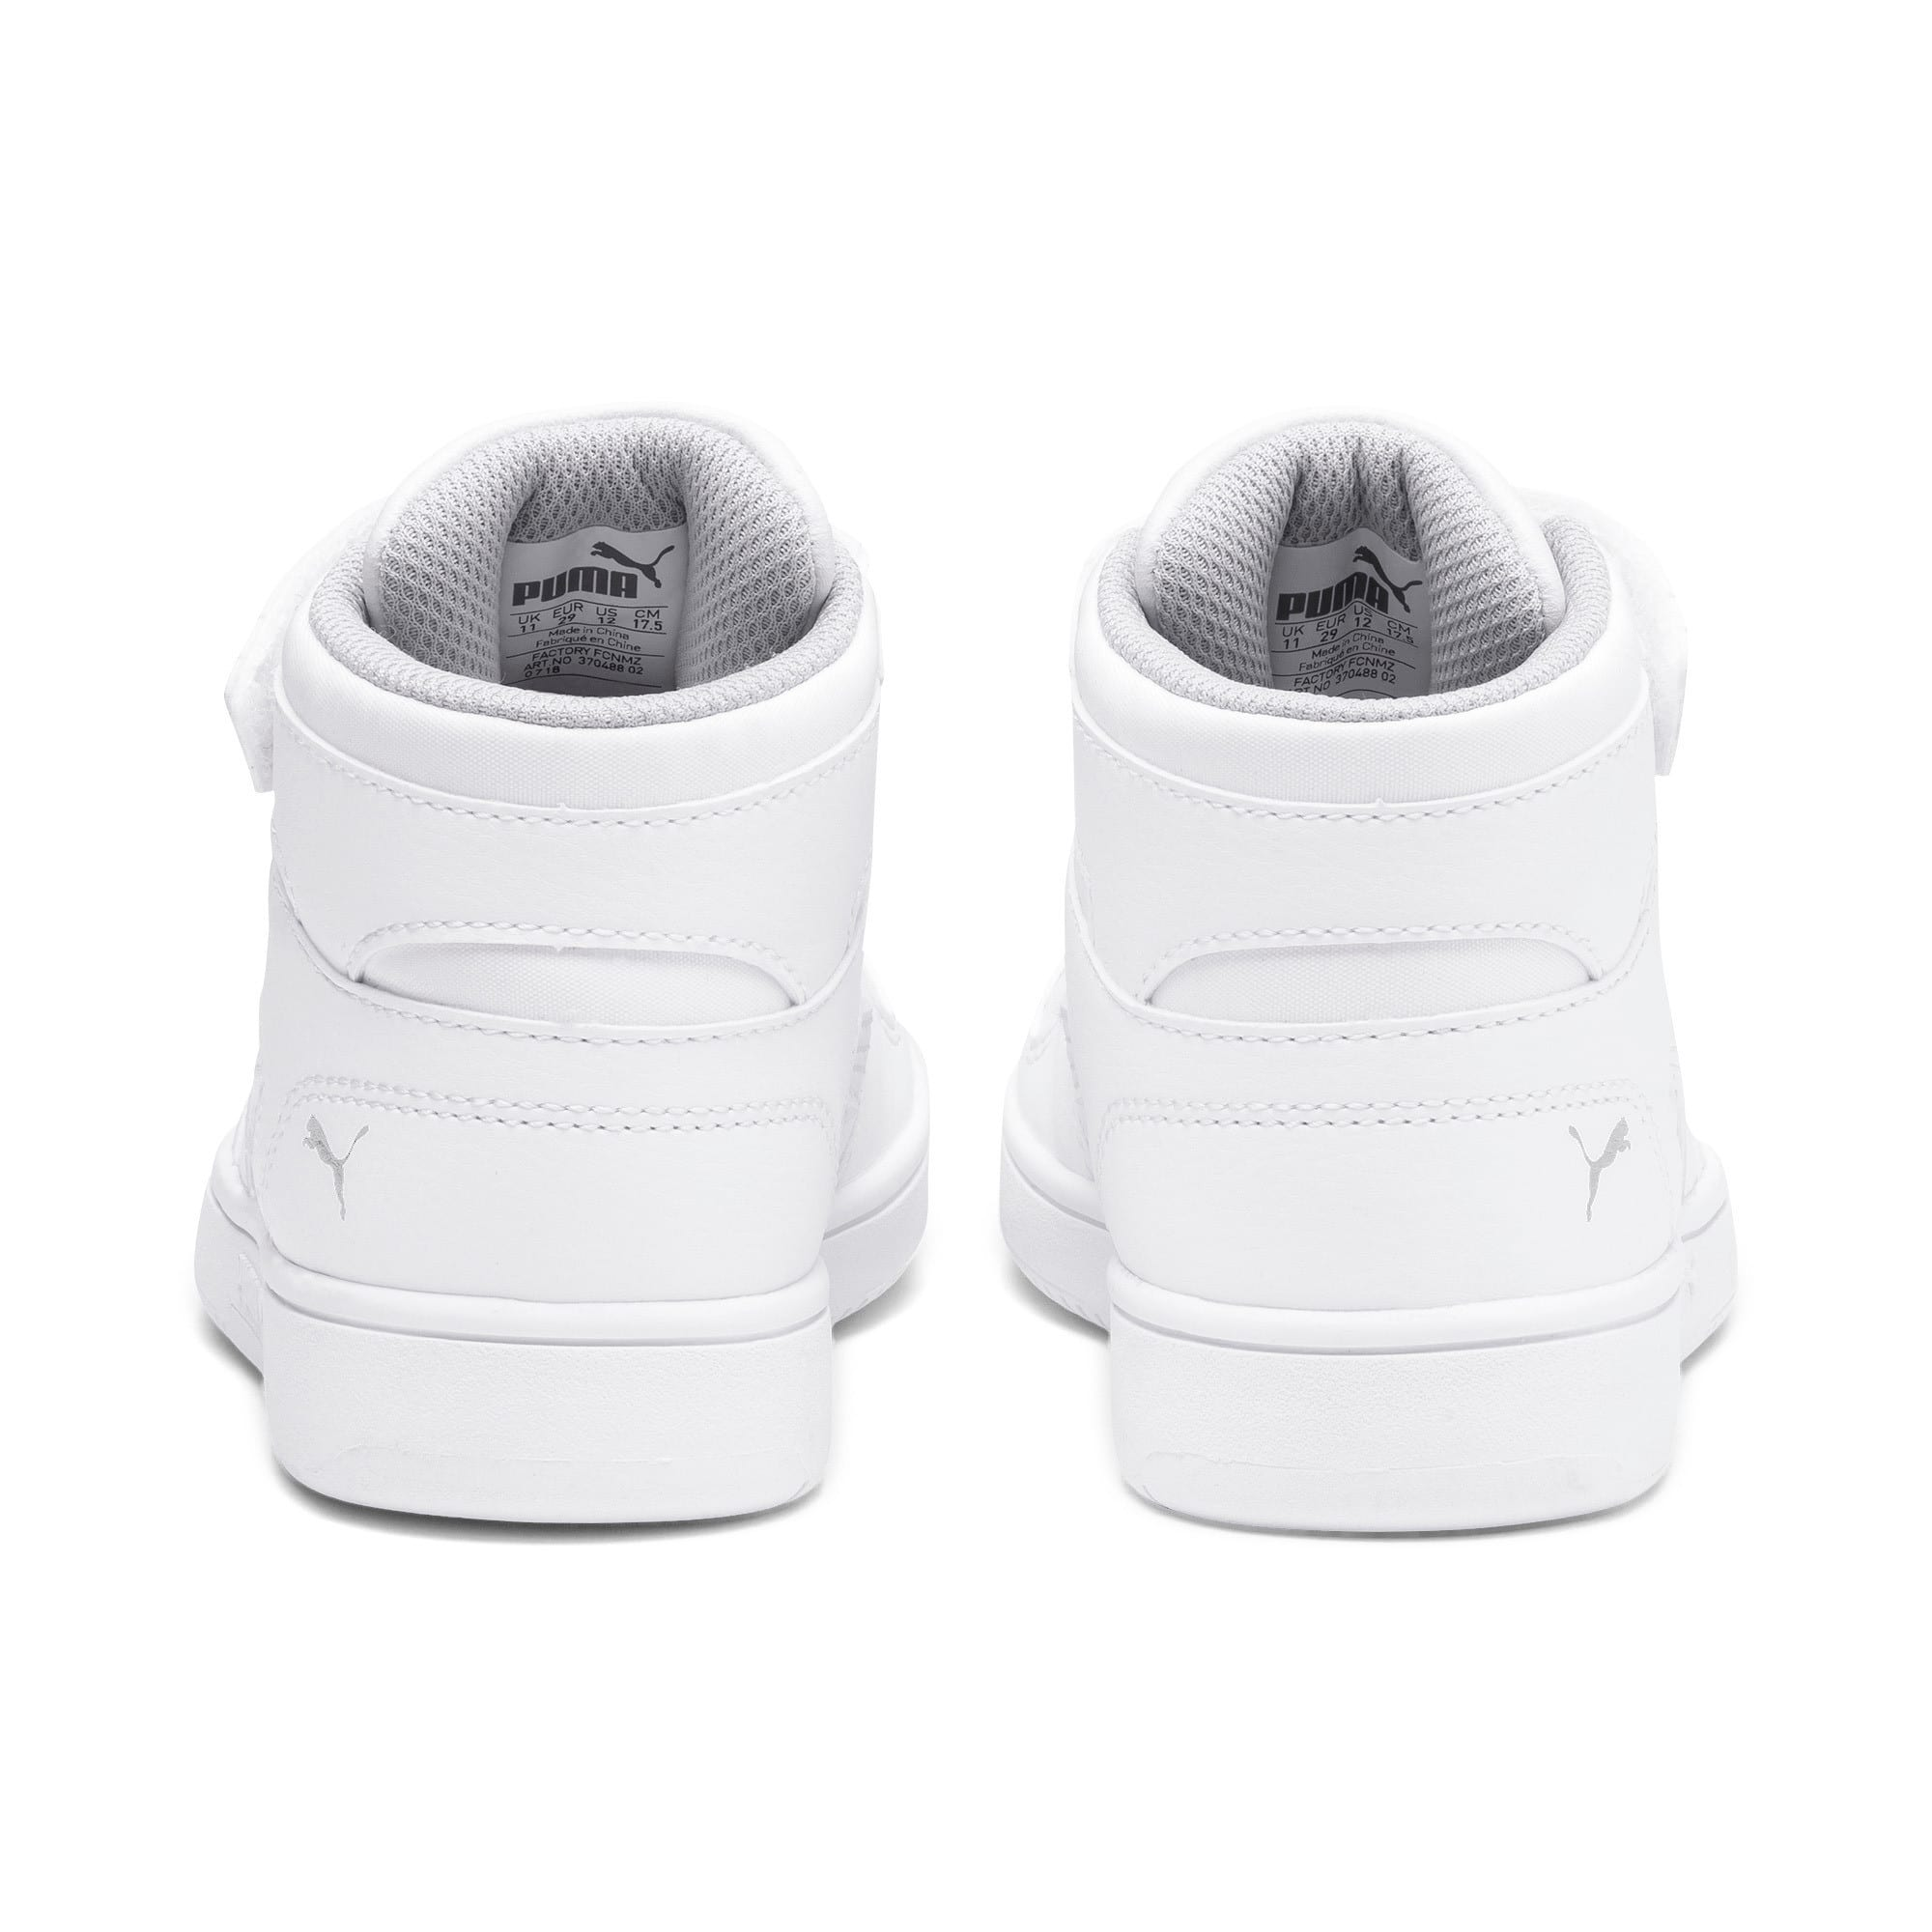 Thumbnail 3 of Rebound Lay-Up SL V Kids Sneaker, Puma White-Gray Violet, medium